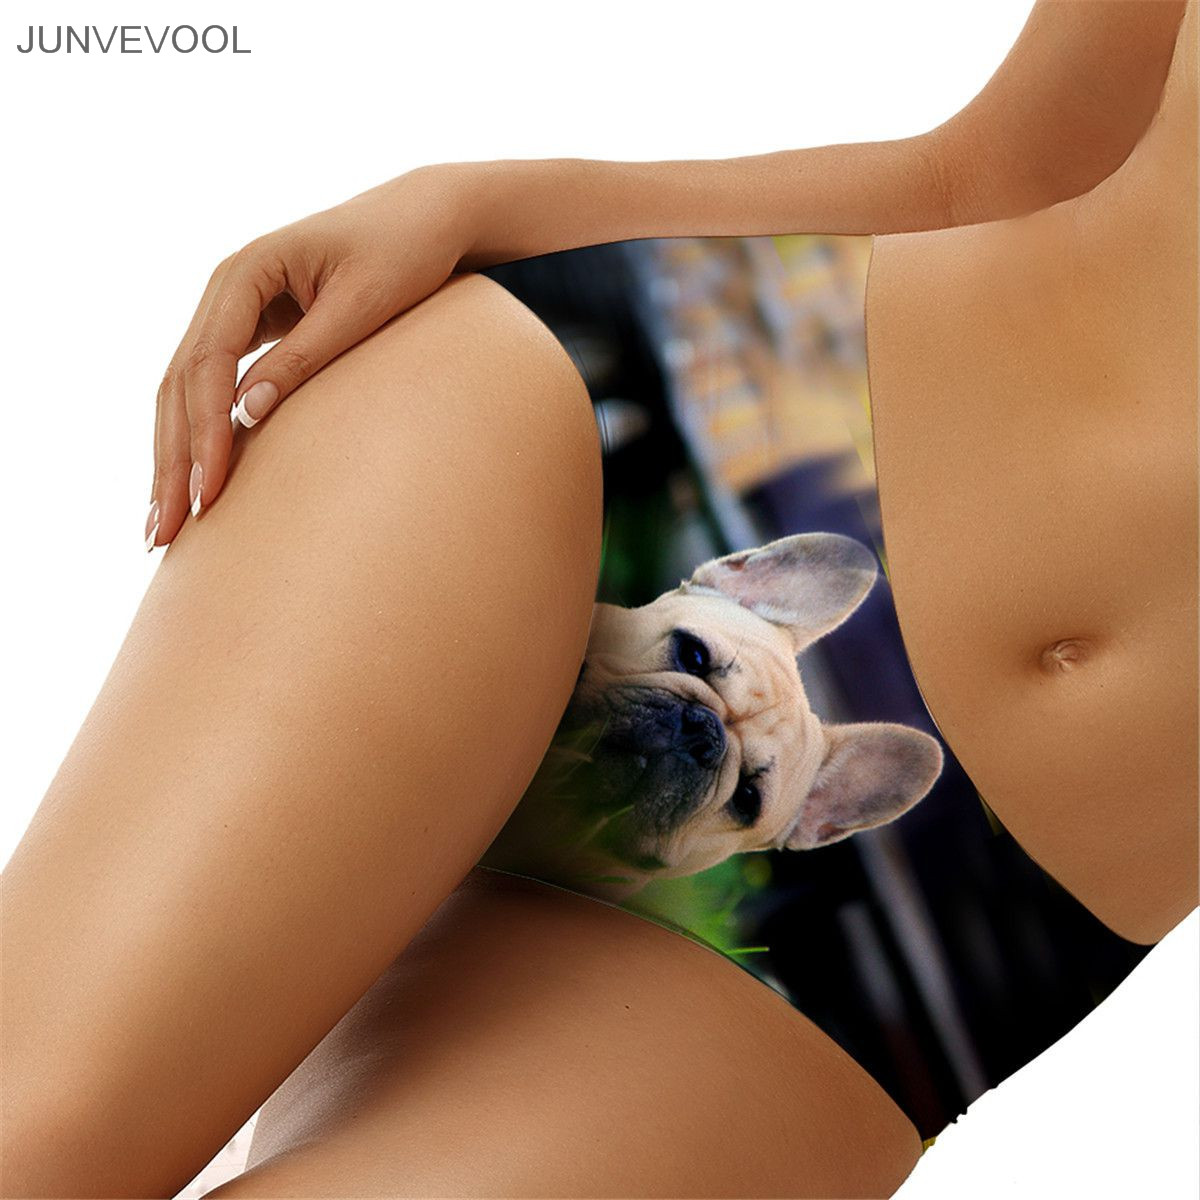 from Jonathon naked women tattoos boy shorts